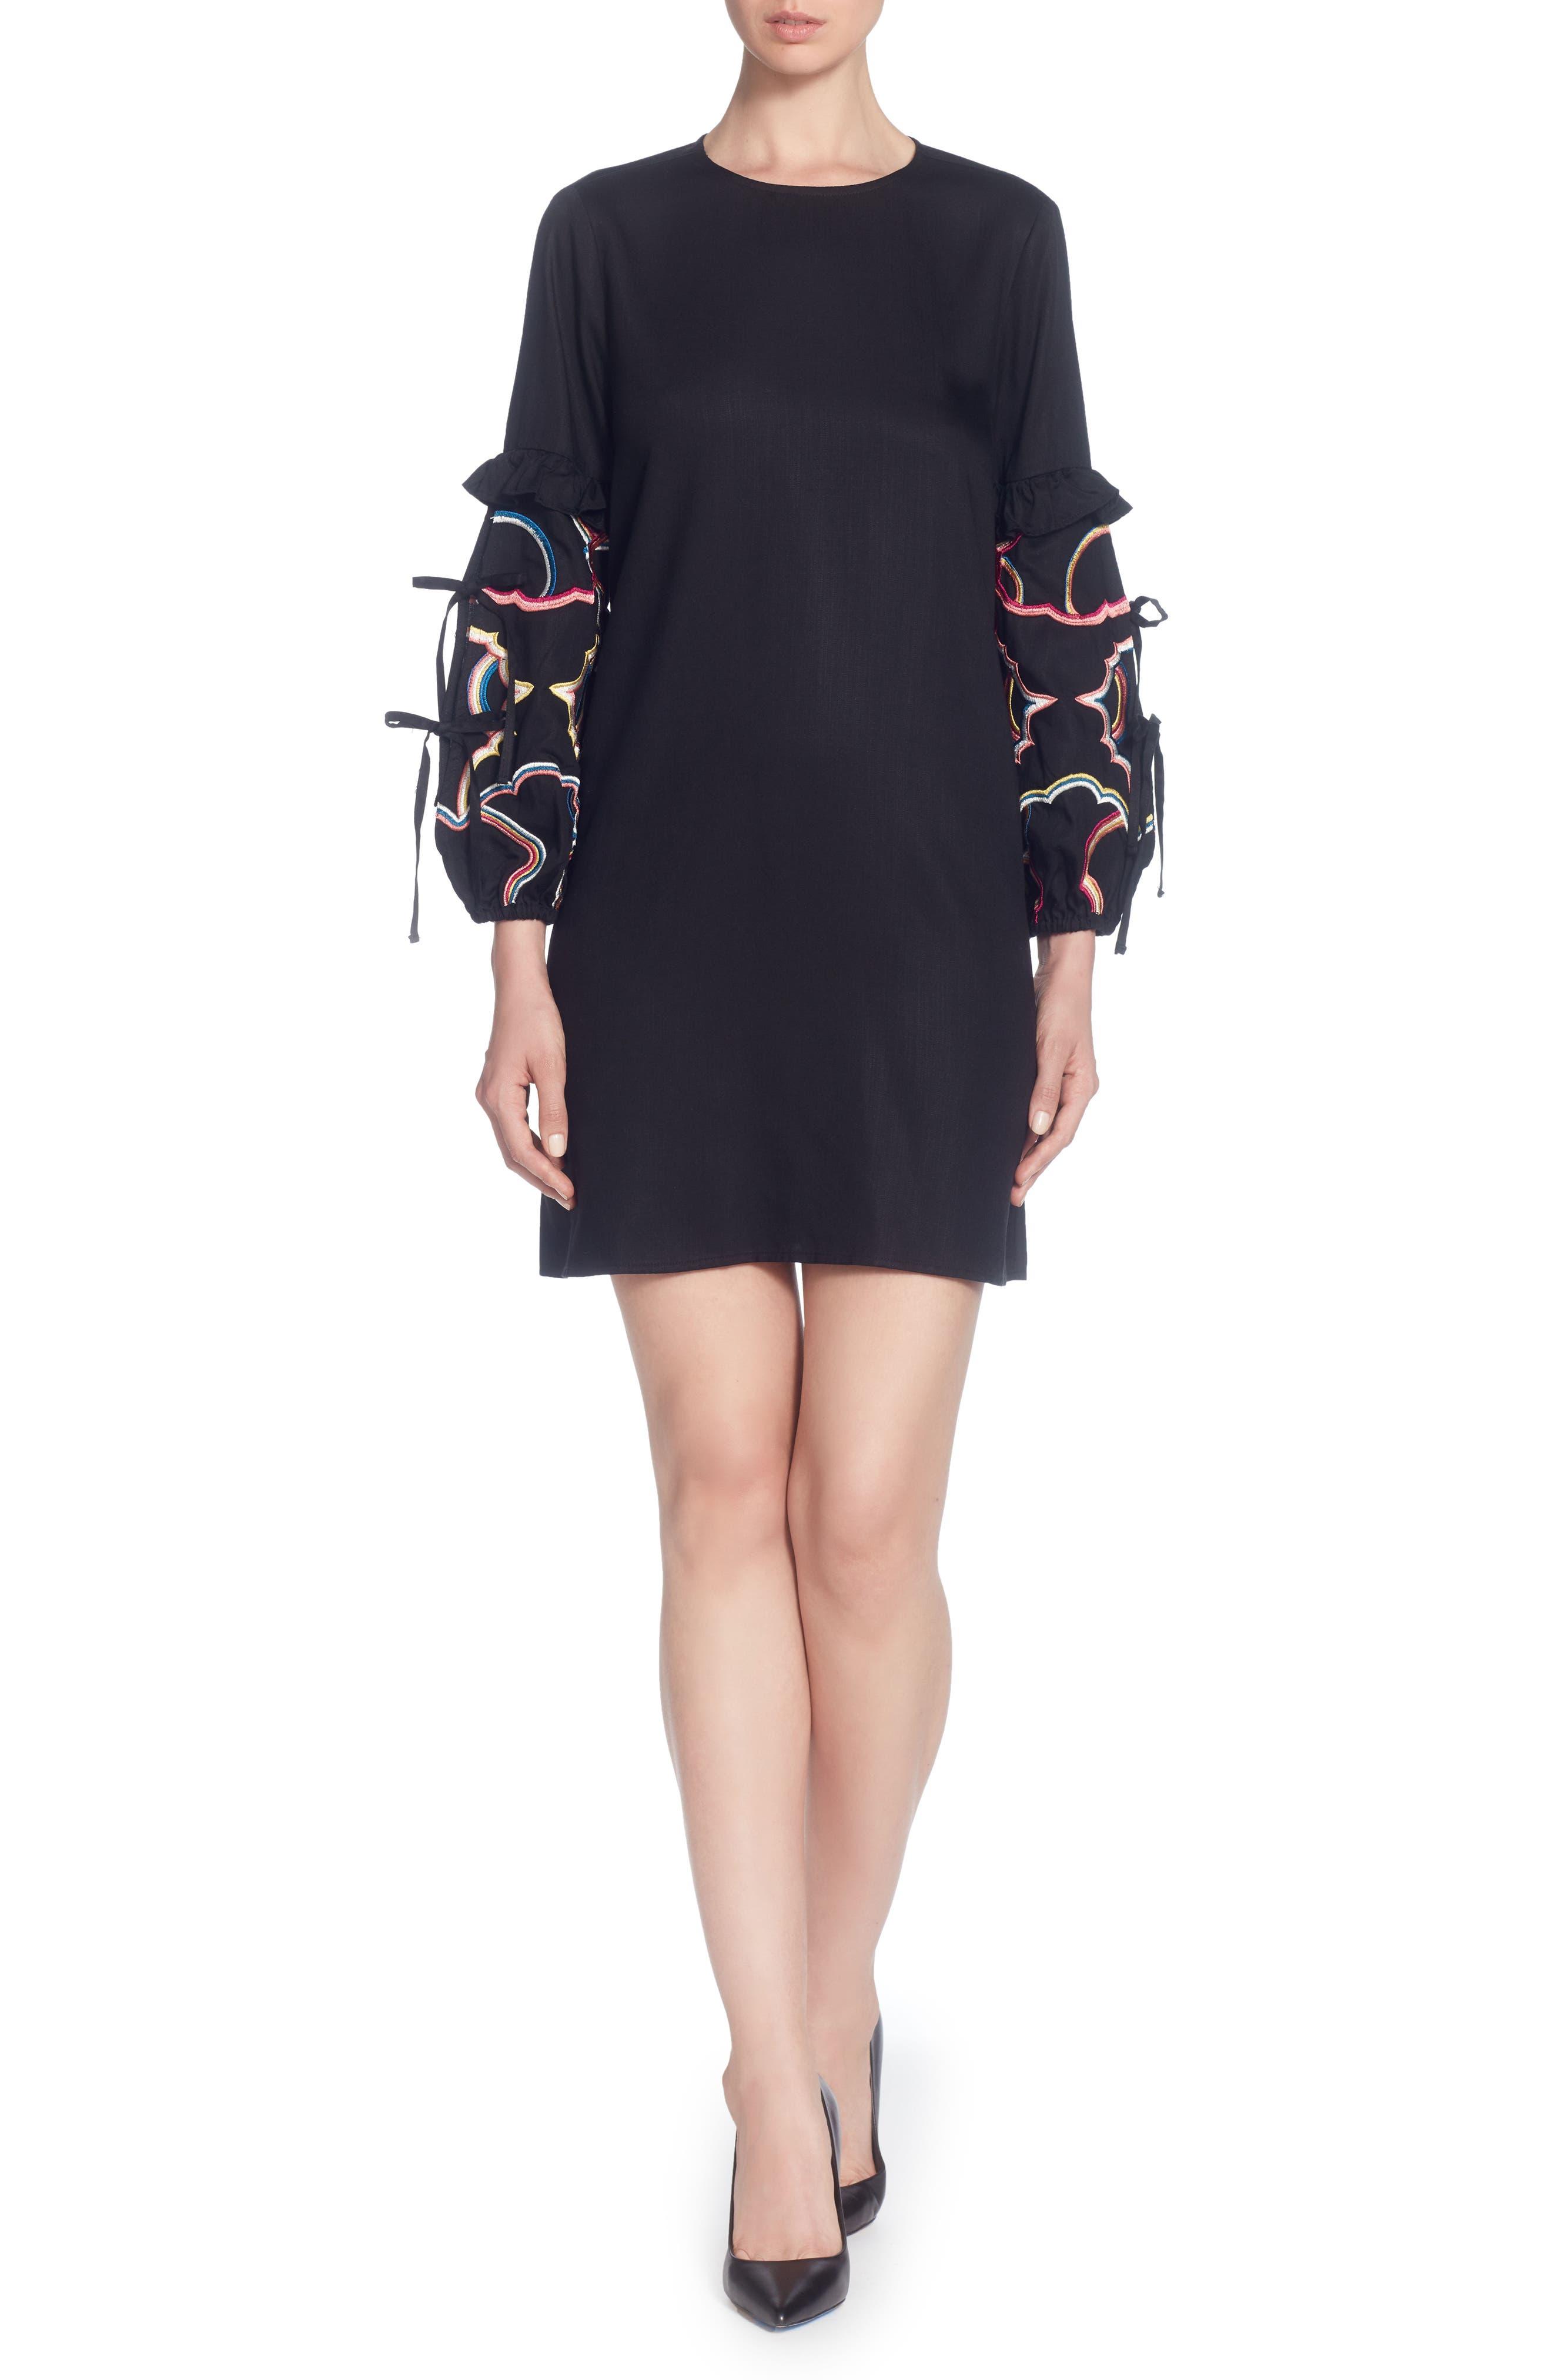 Dahl Embroidered Sleeve Dress,                         Main,                         color, Black